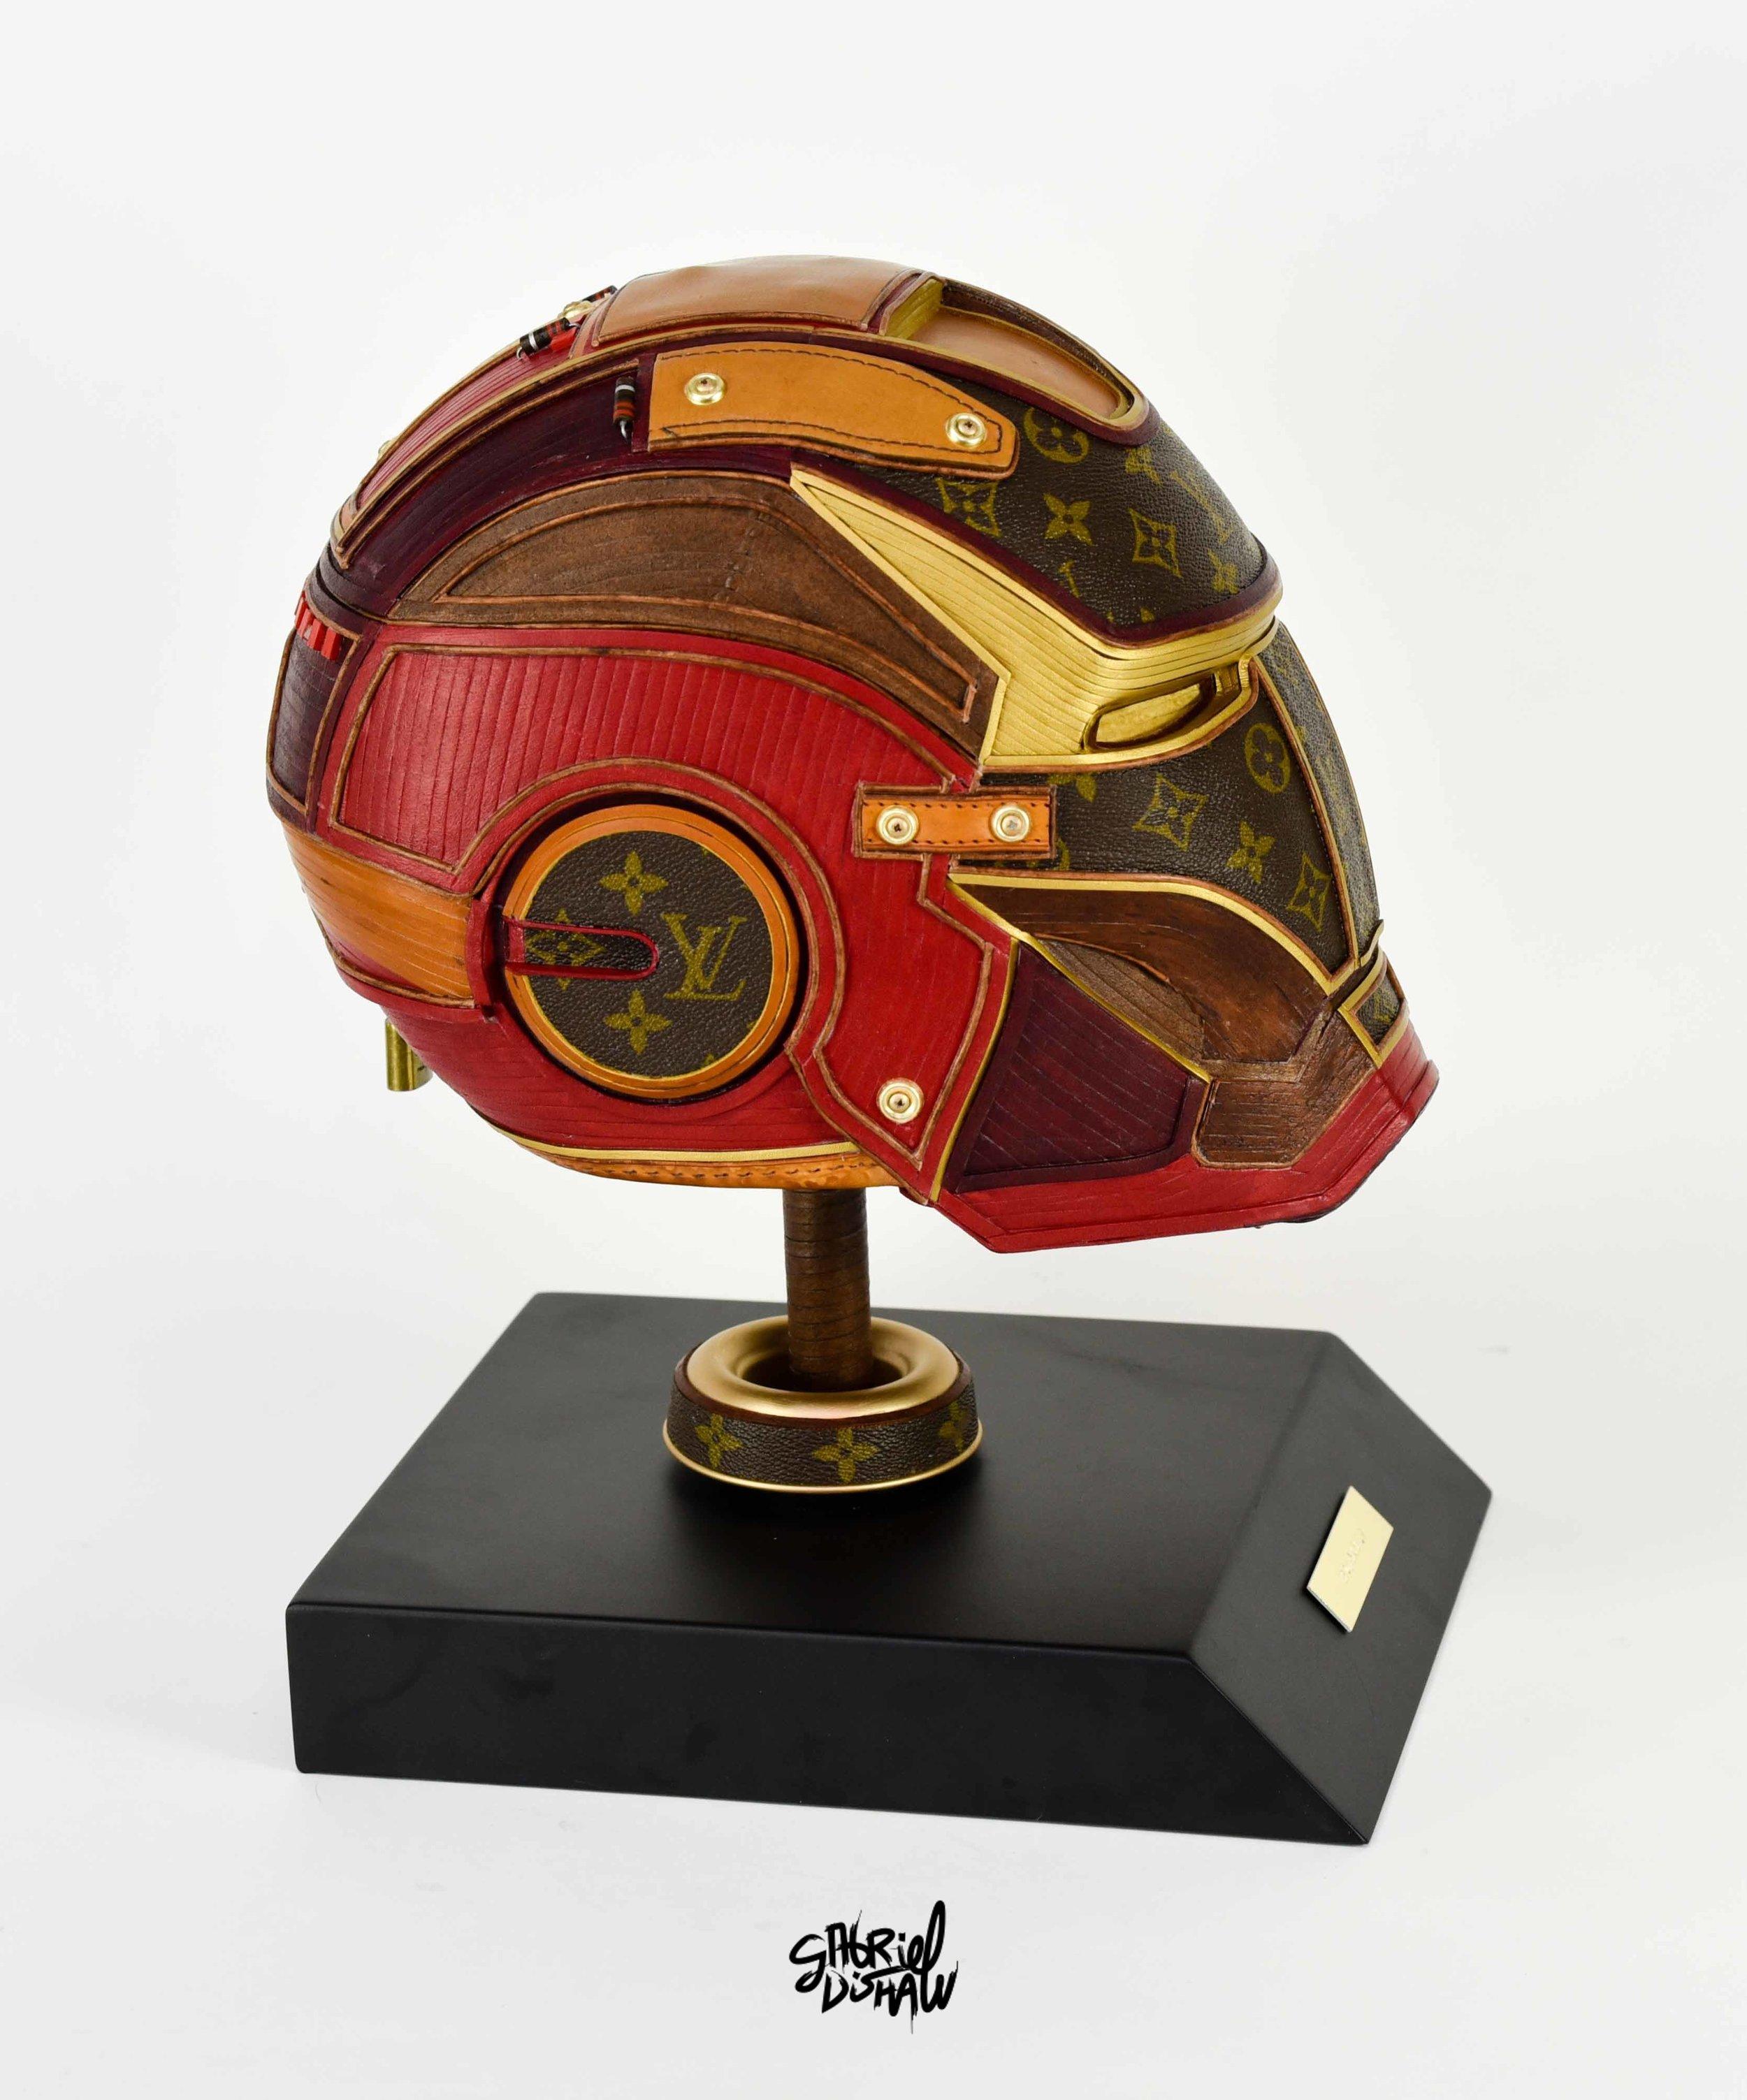 Gabriel Dishaw Iron Man LV-4152.jpg